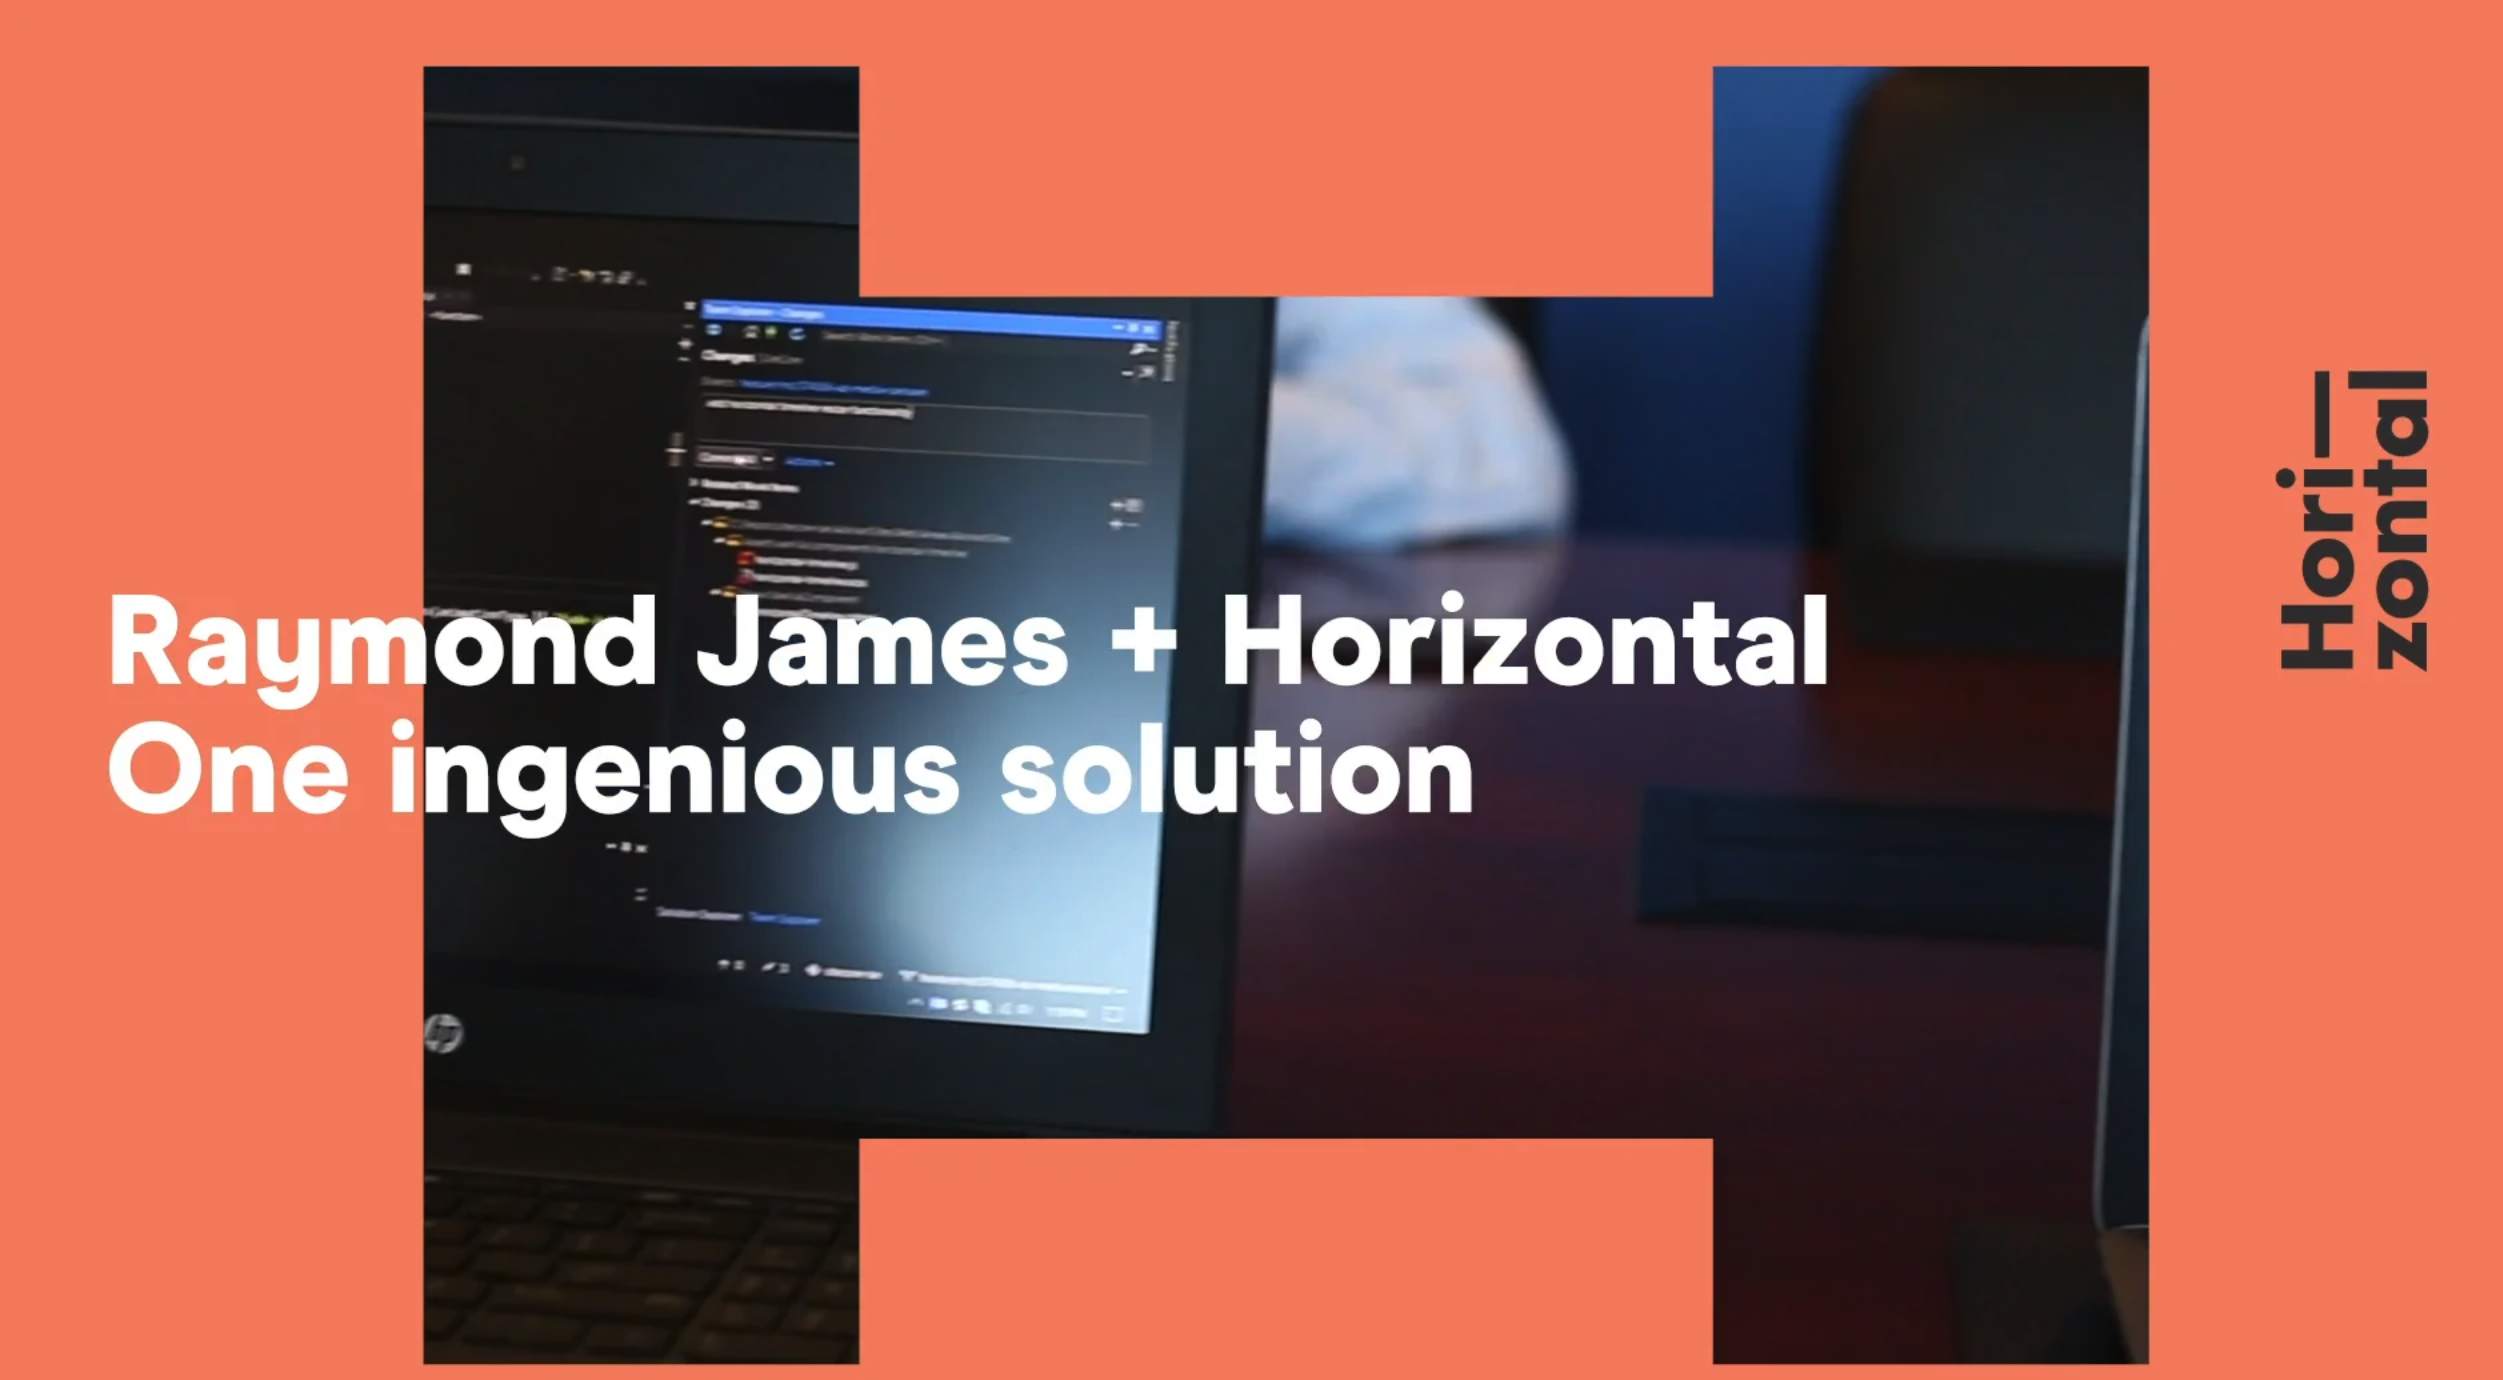 RJ-Horizontal-Video-Image